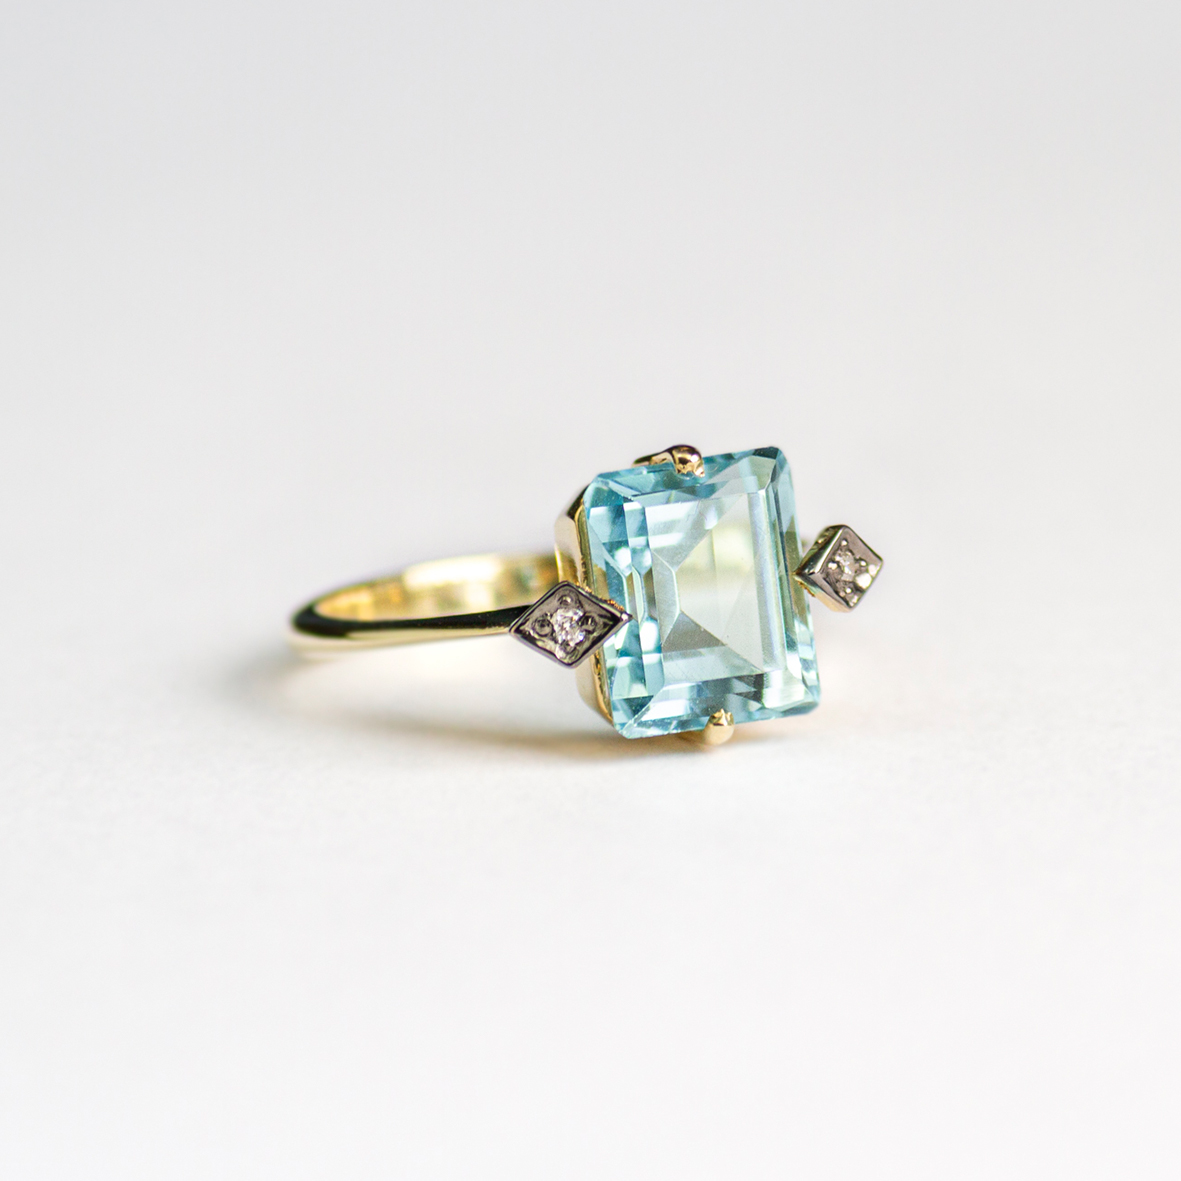 3. OONA_gems of ceylon_principal_blue aquamarine ring